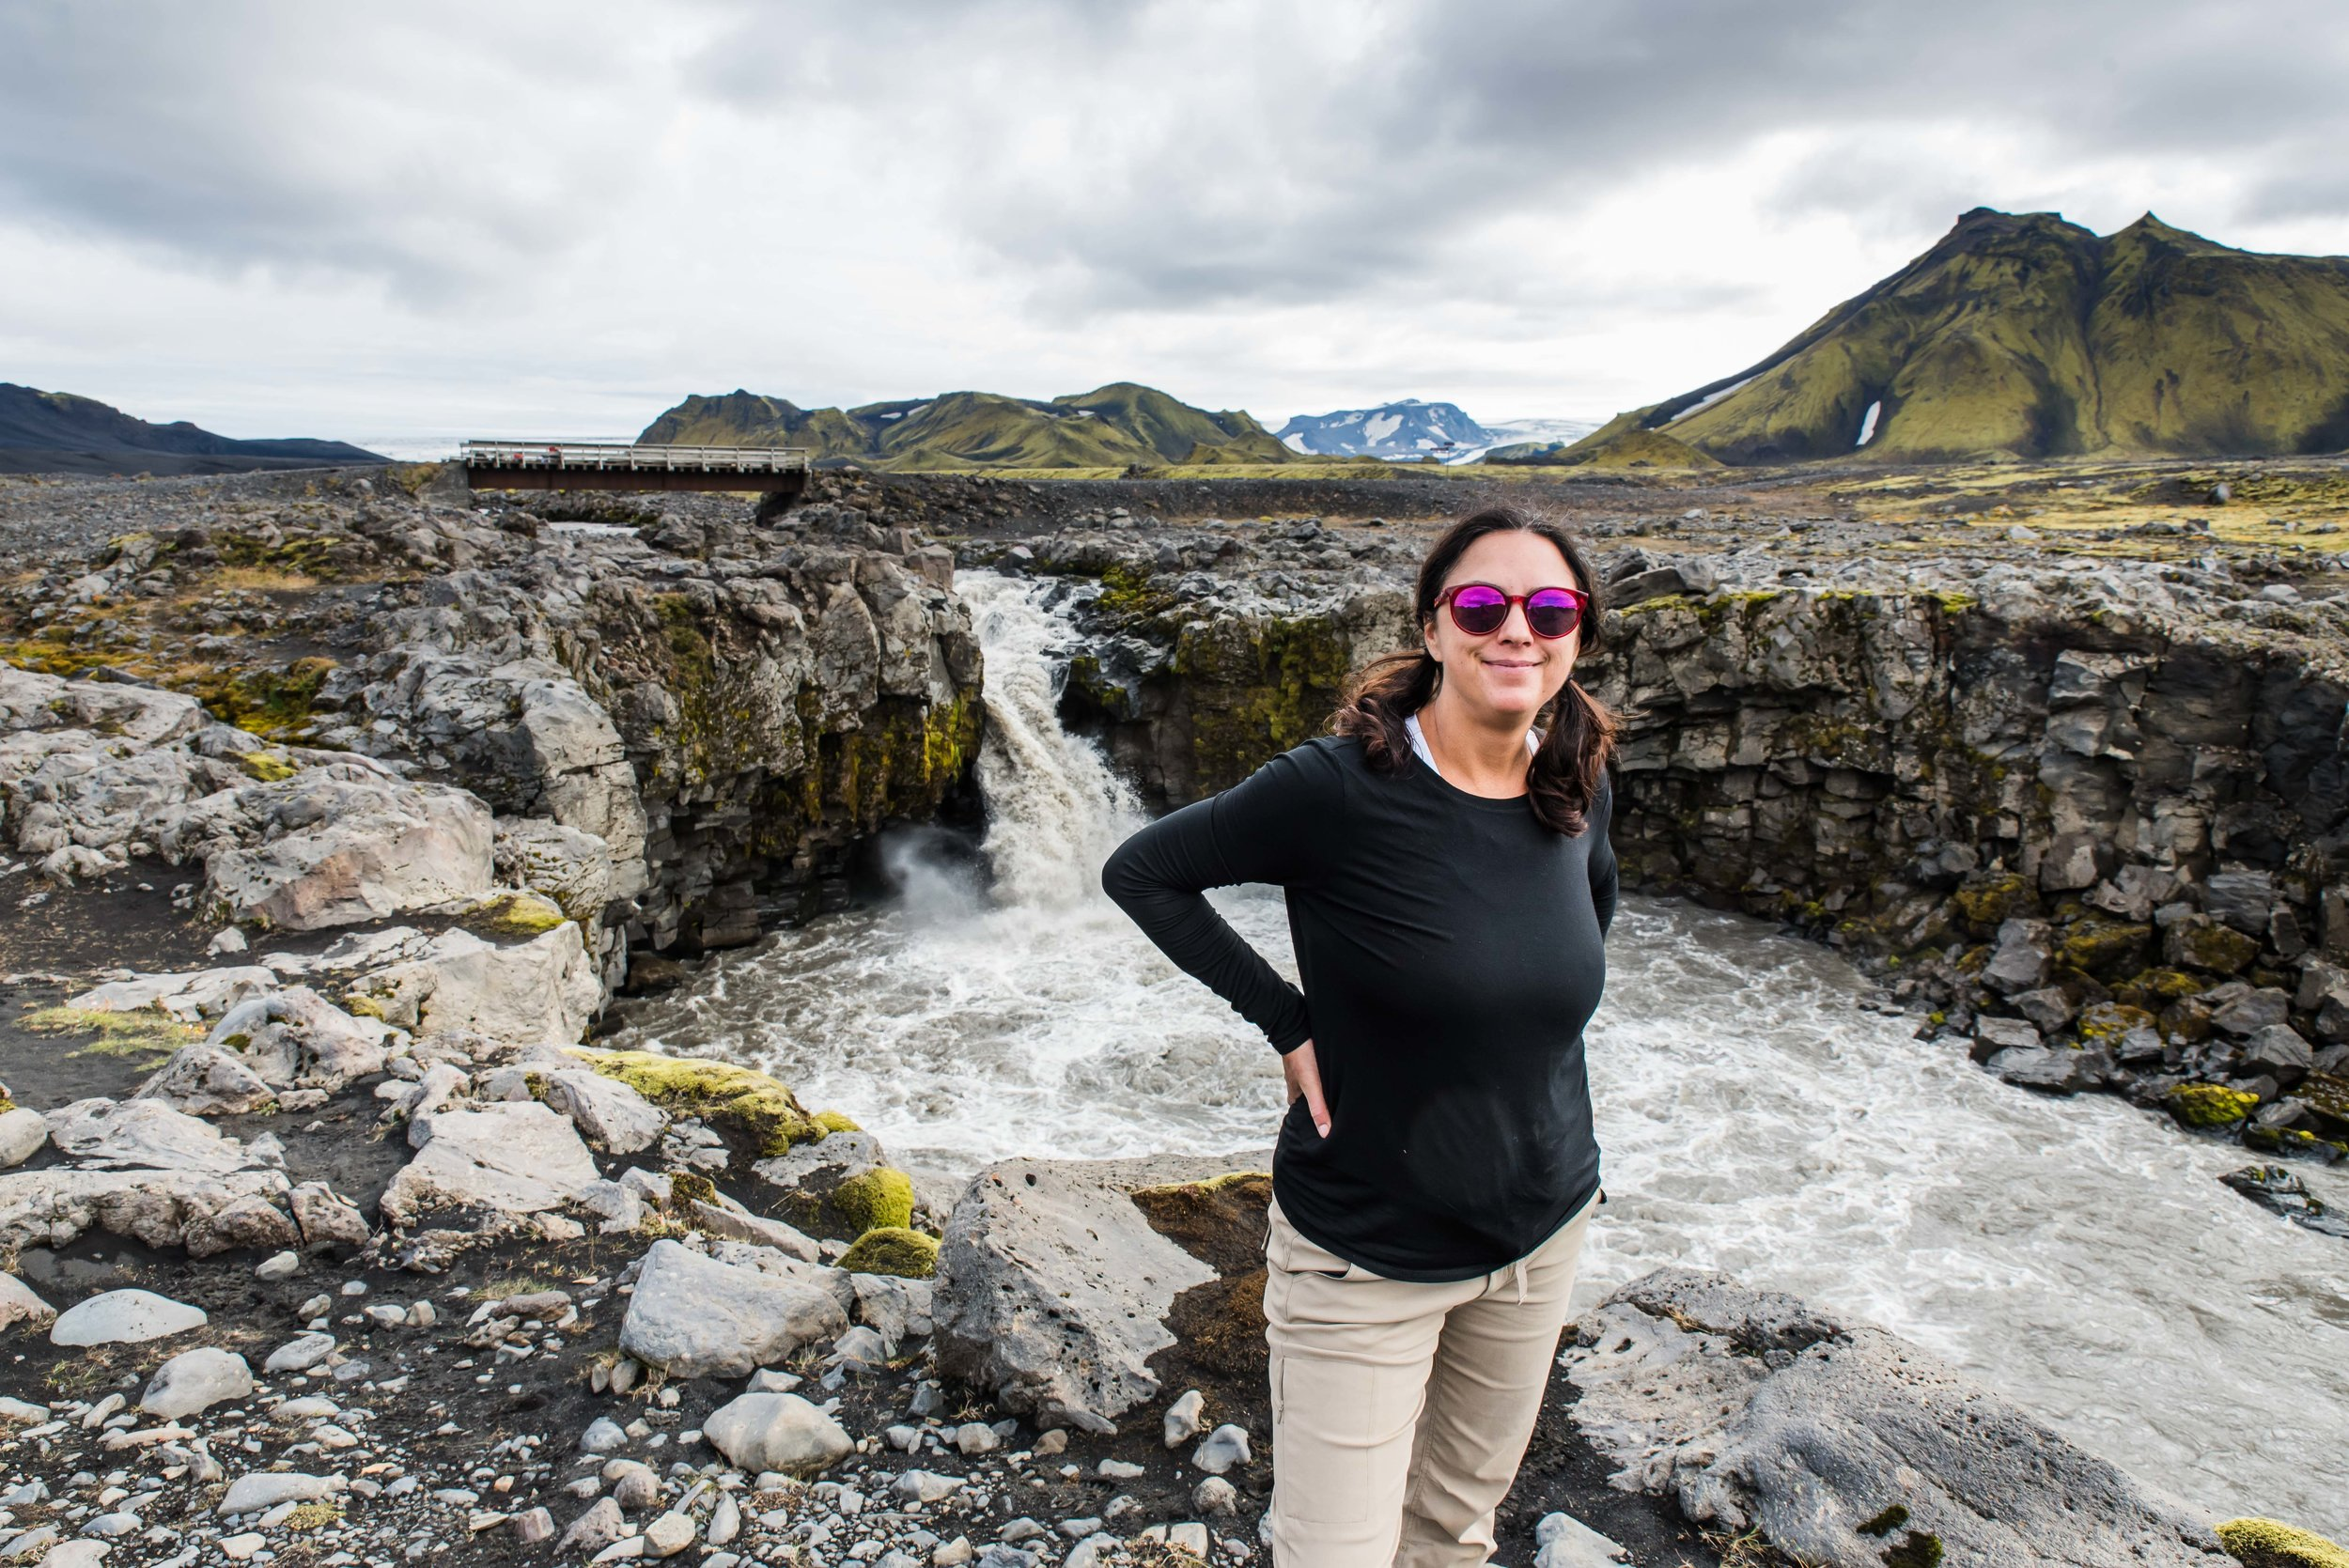 Iceland127_KelliPricePhotography_Iceland_September2018 copy.jpg